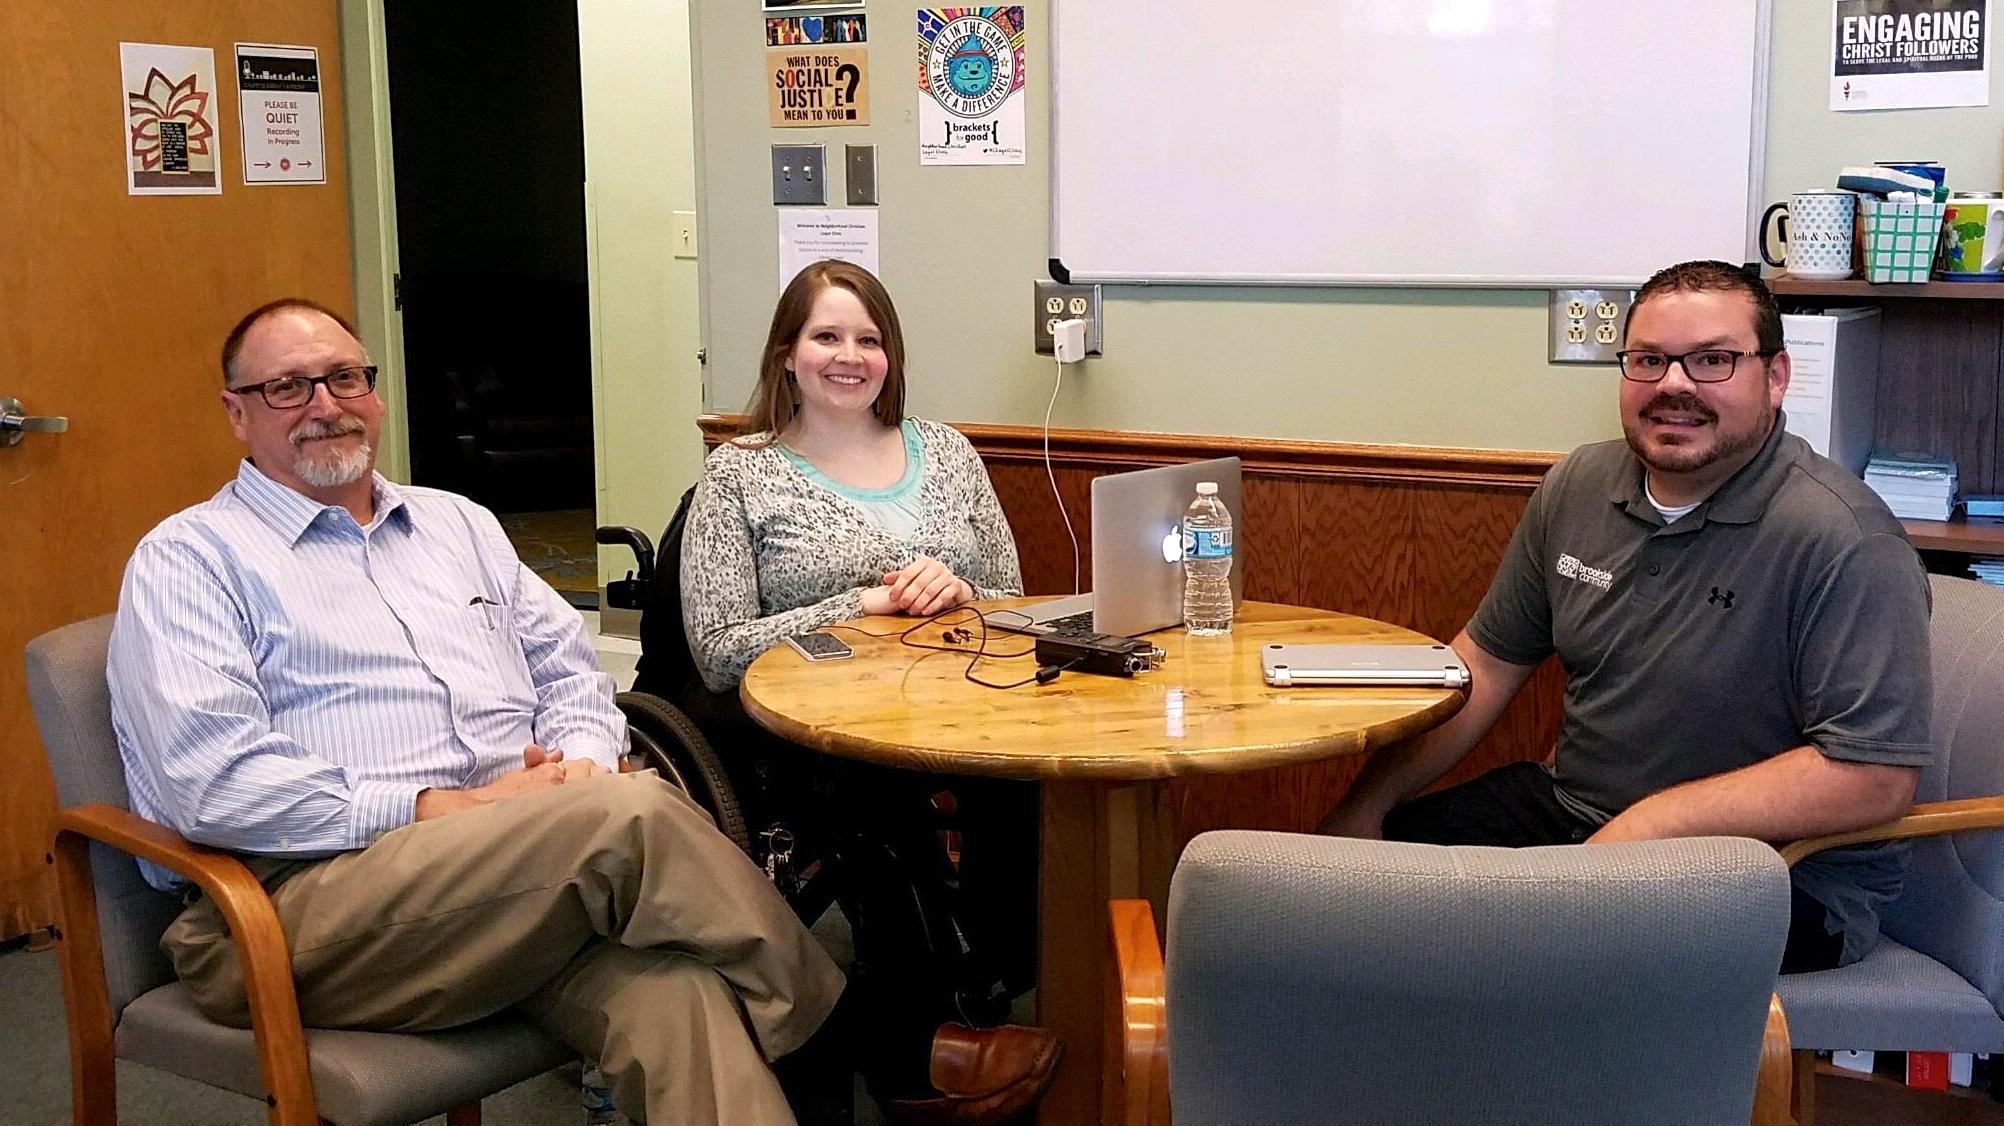 L to R: Mike Bowling, Ashley Caveda, & David Cederquist